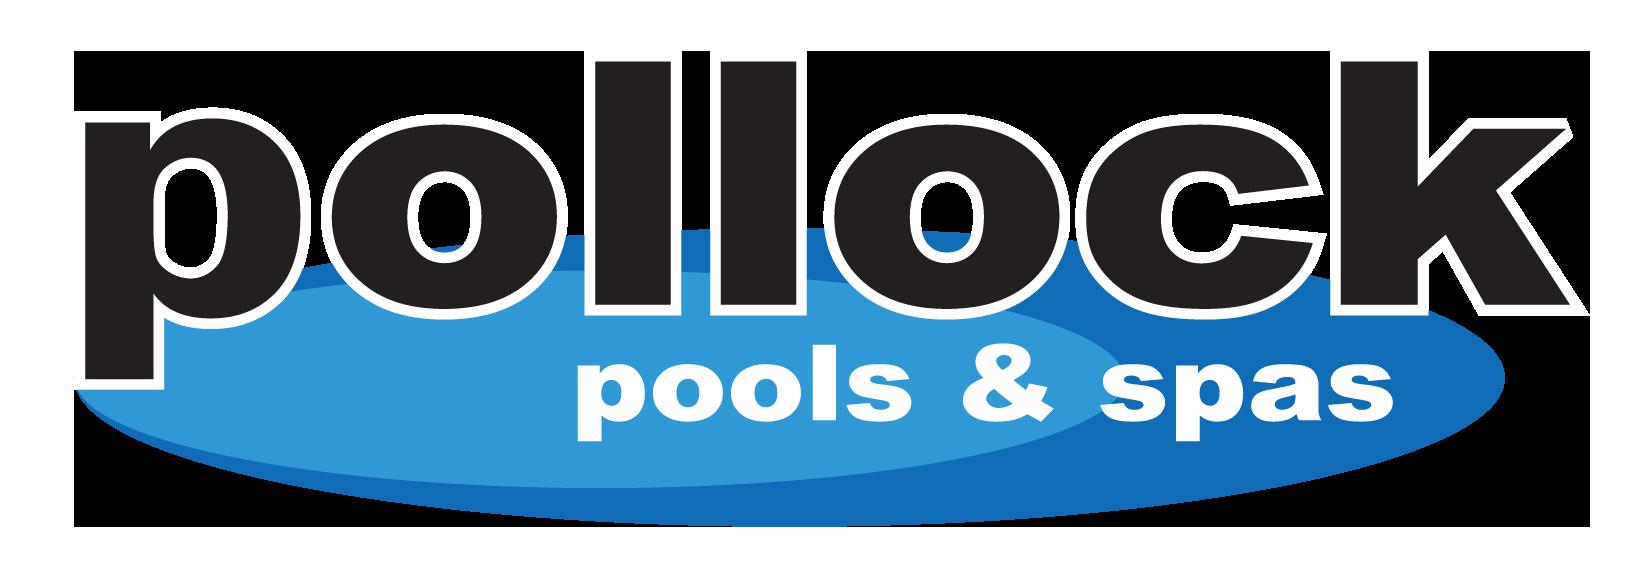 pollock-pools-logo-web